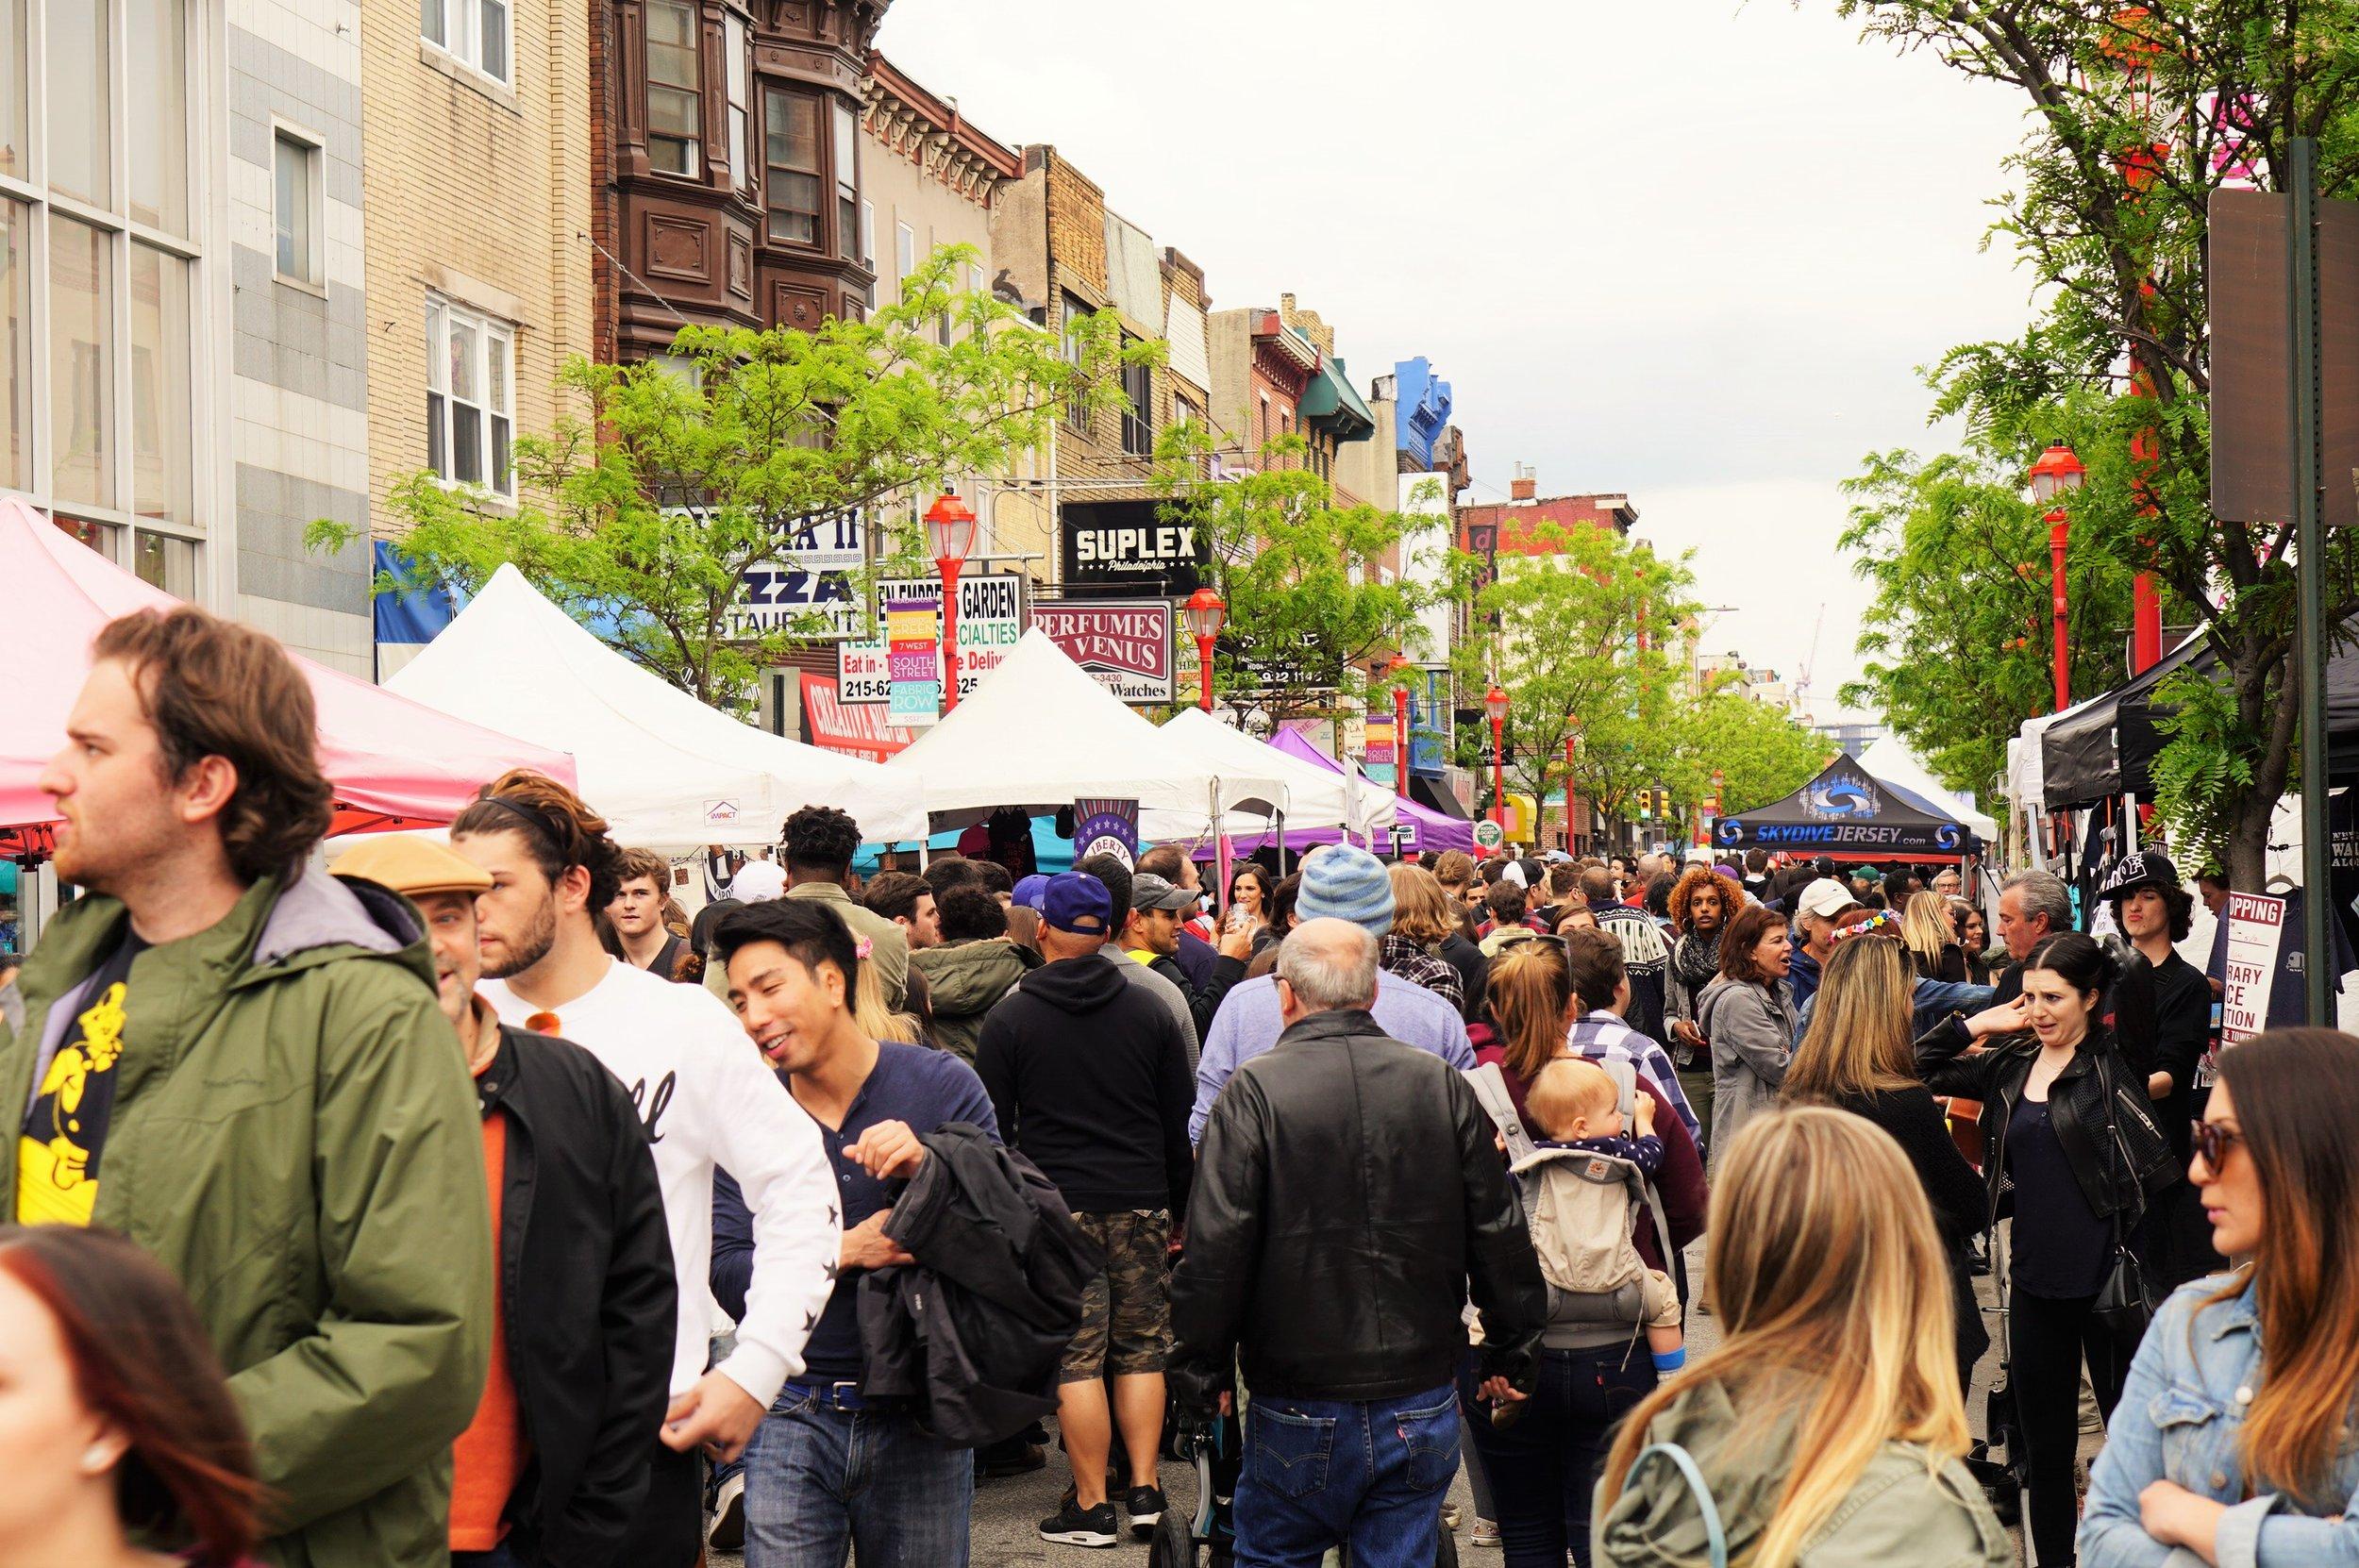 Springfest, South Street